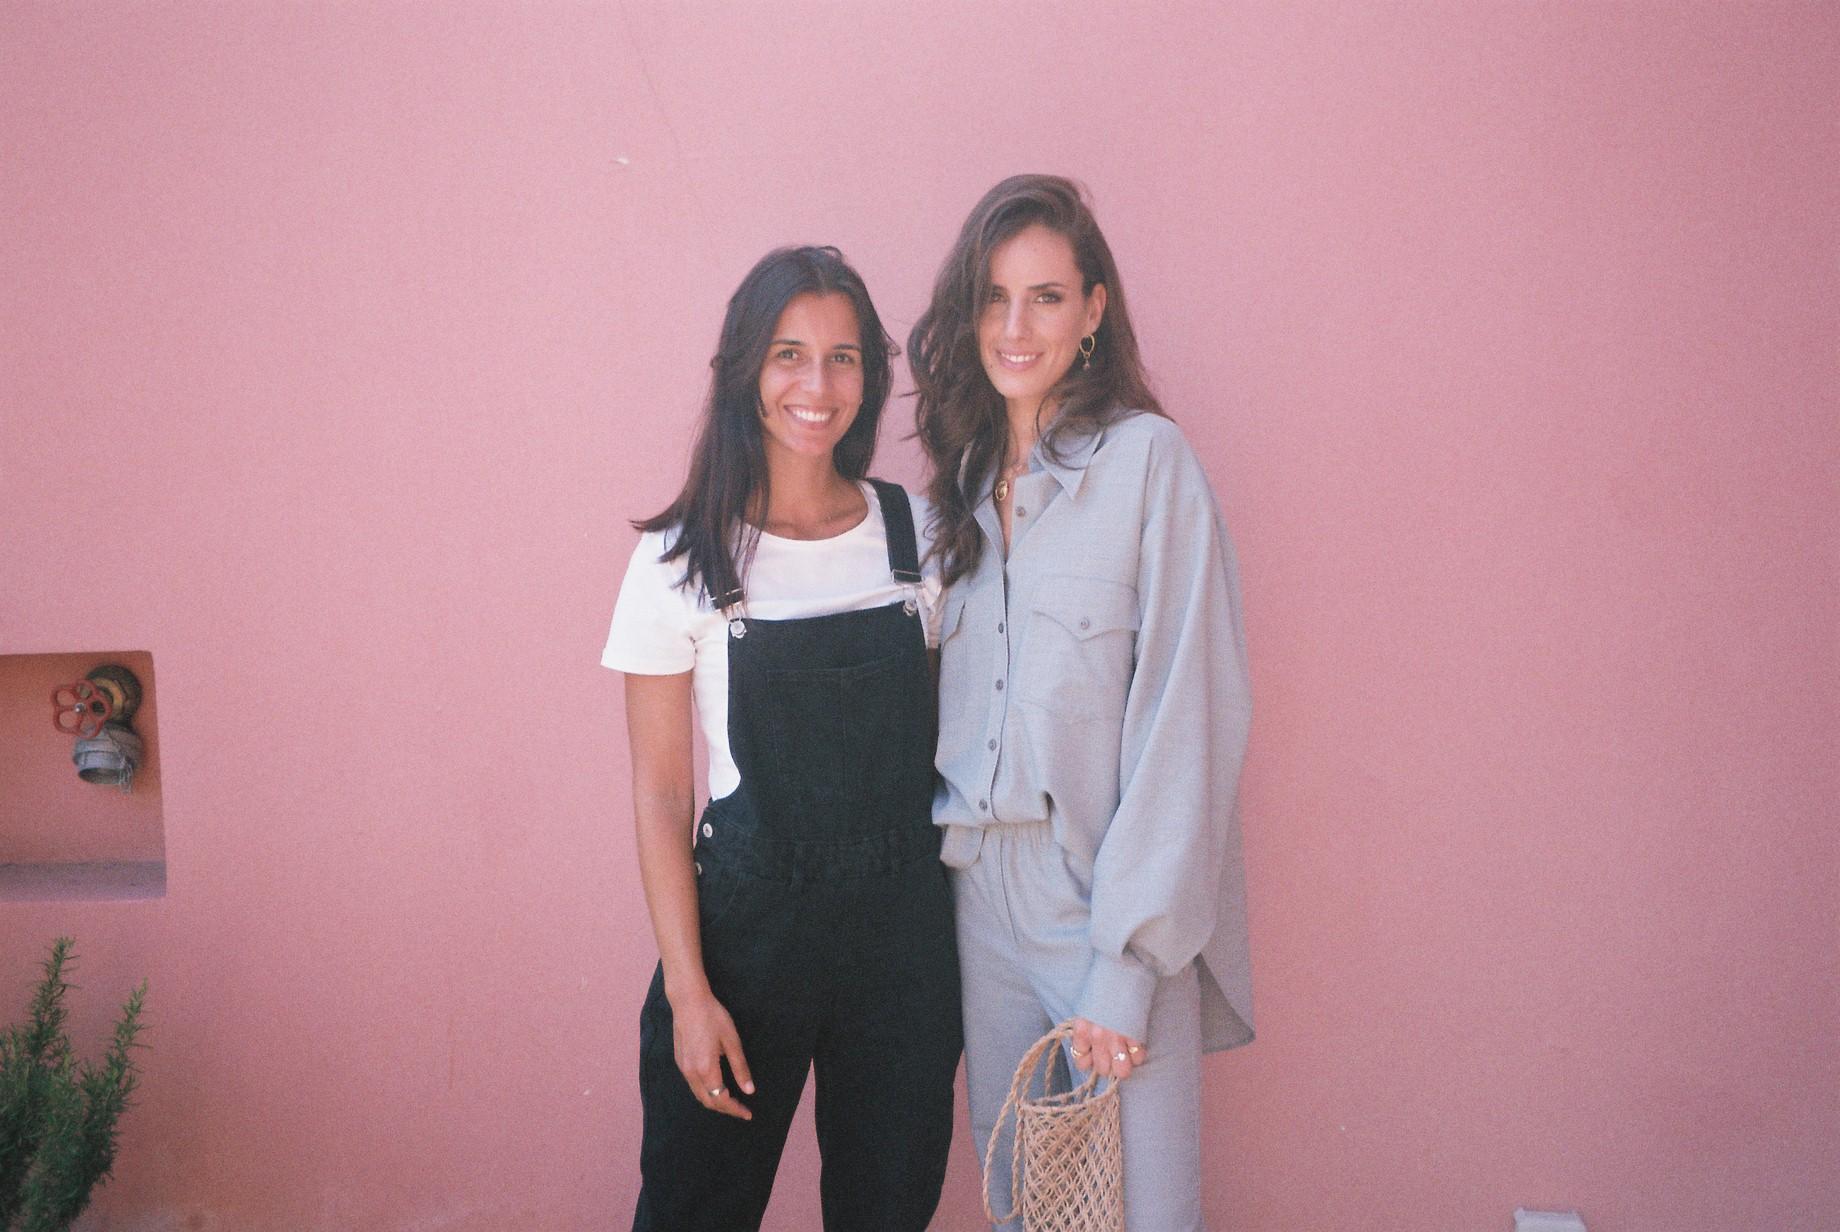 With the sweetest publicist in town, Priscila. /  Com a publicist mais amorosa do mundo, Priscila.